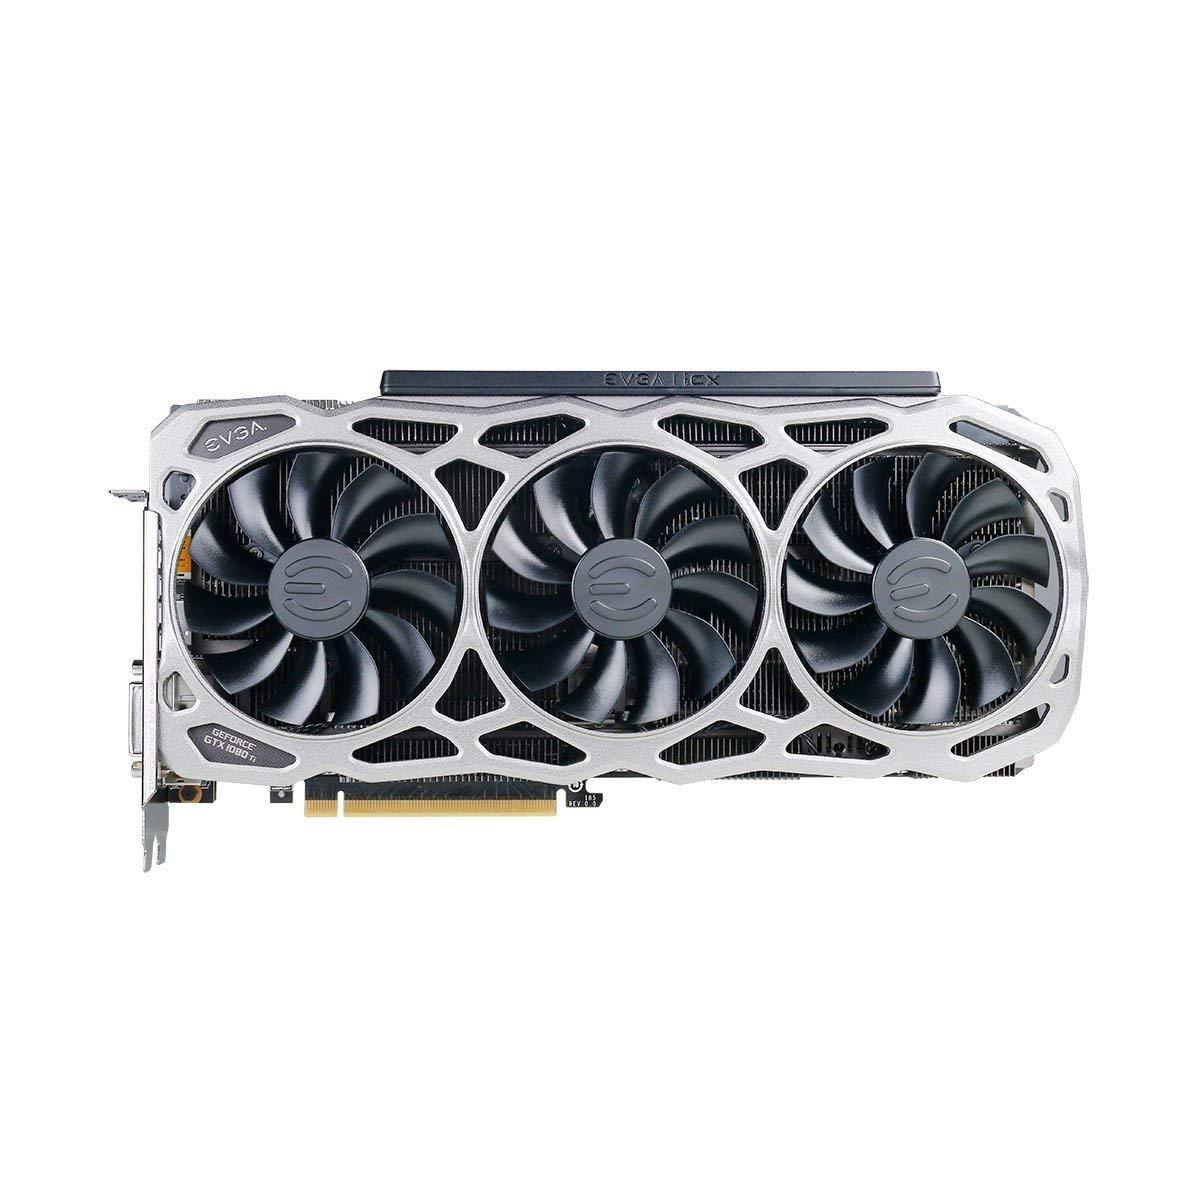 Amazon.com: EVGA GeForce GTX 1080 Ti FOUNDERS EDITION GAMING ...